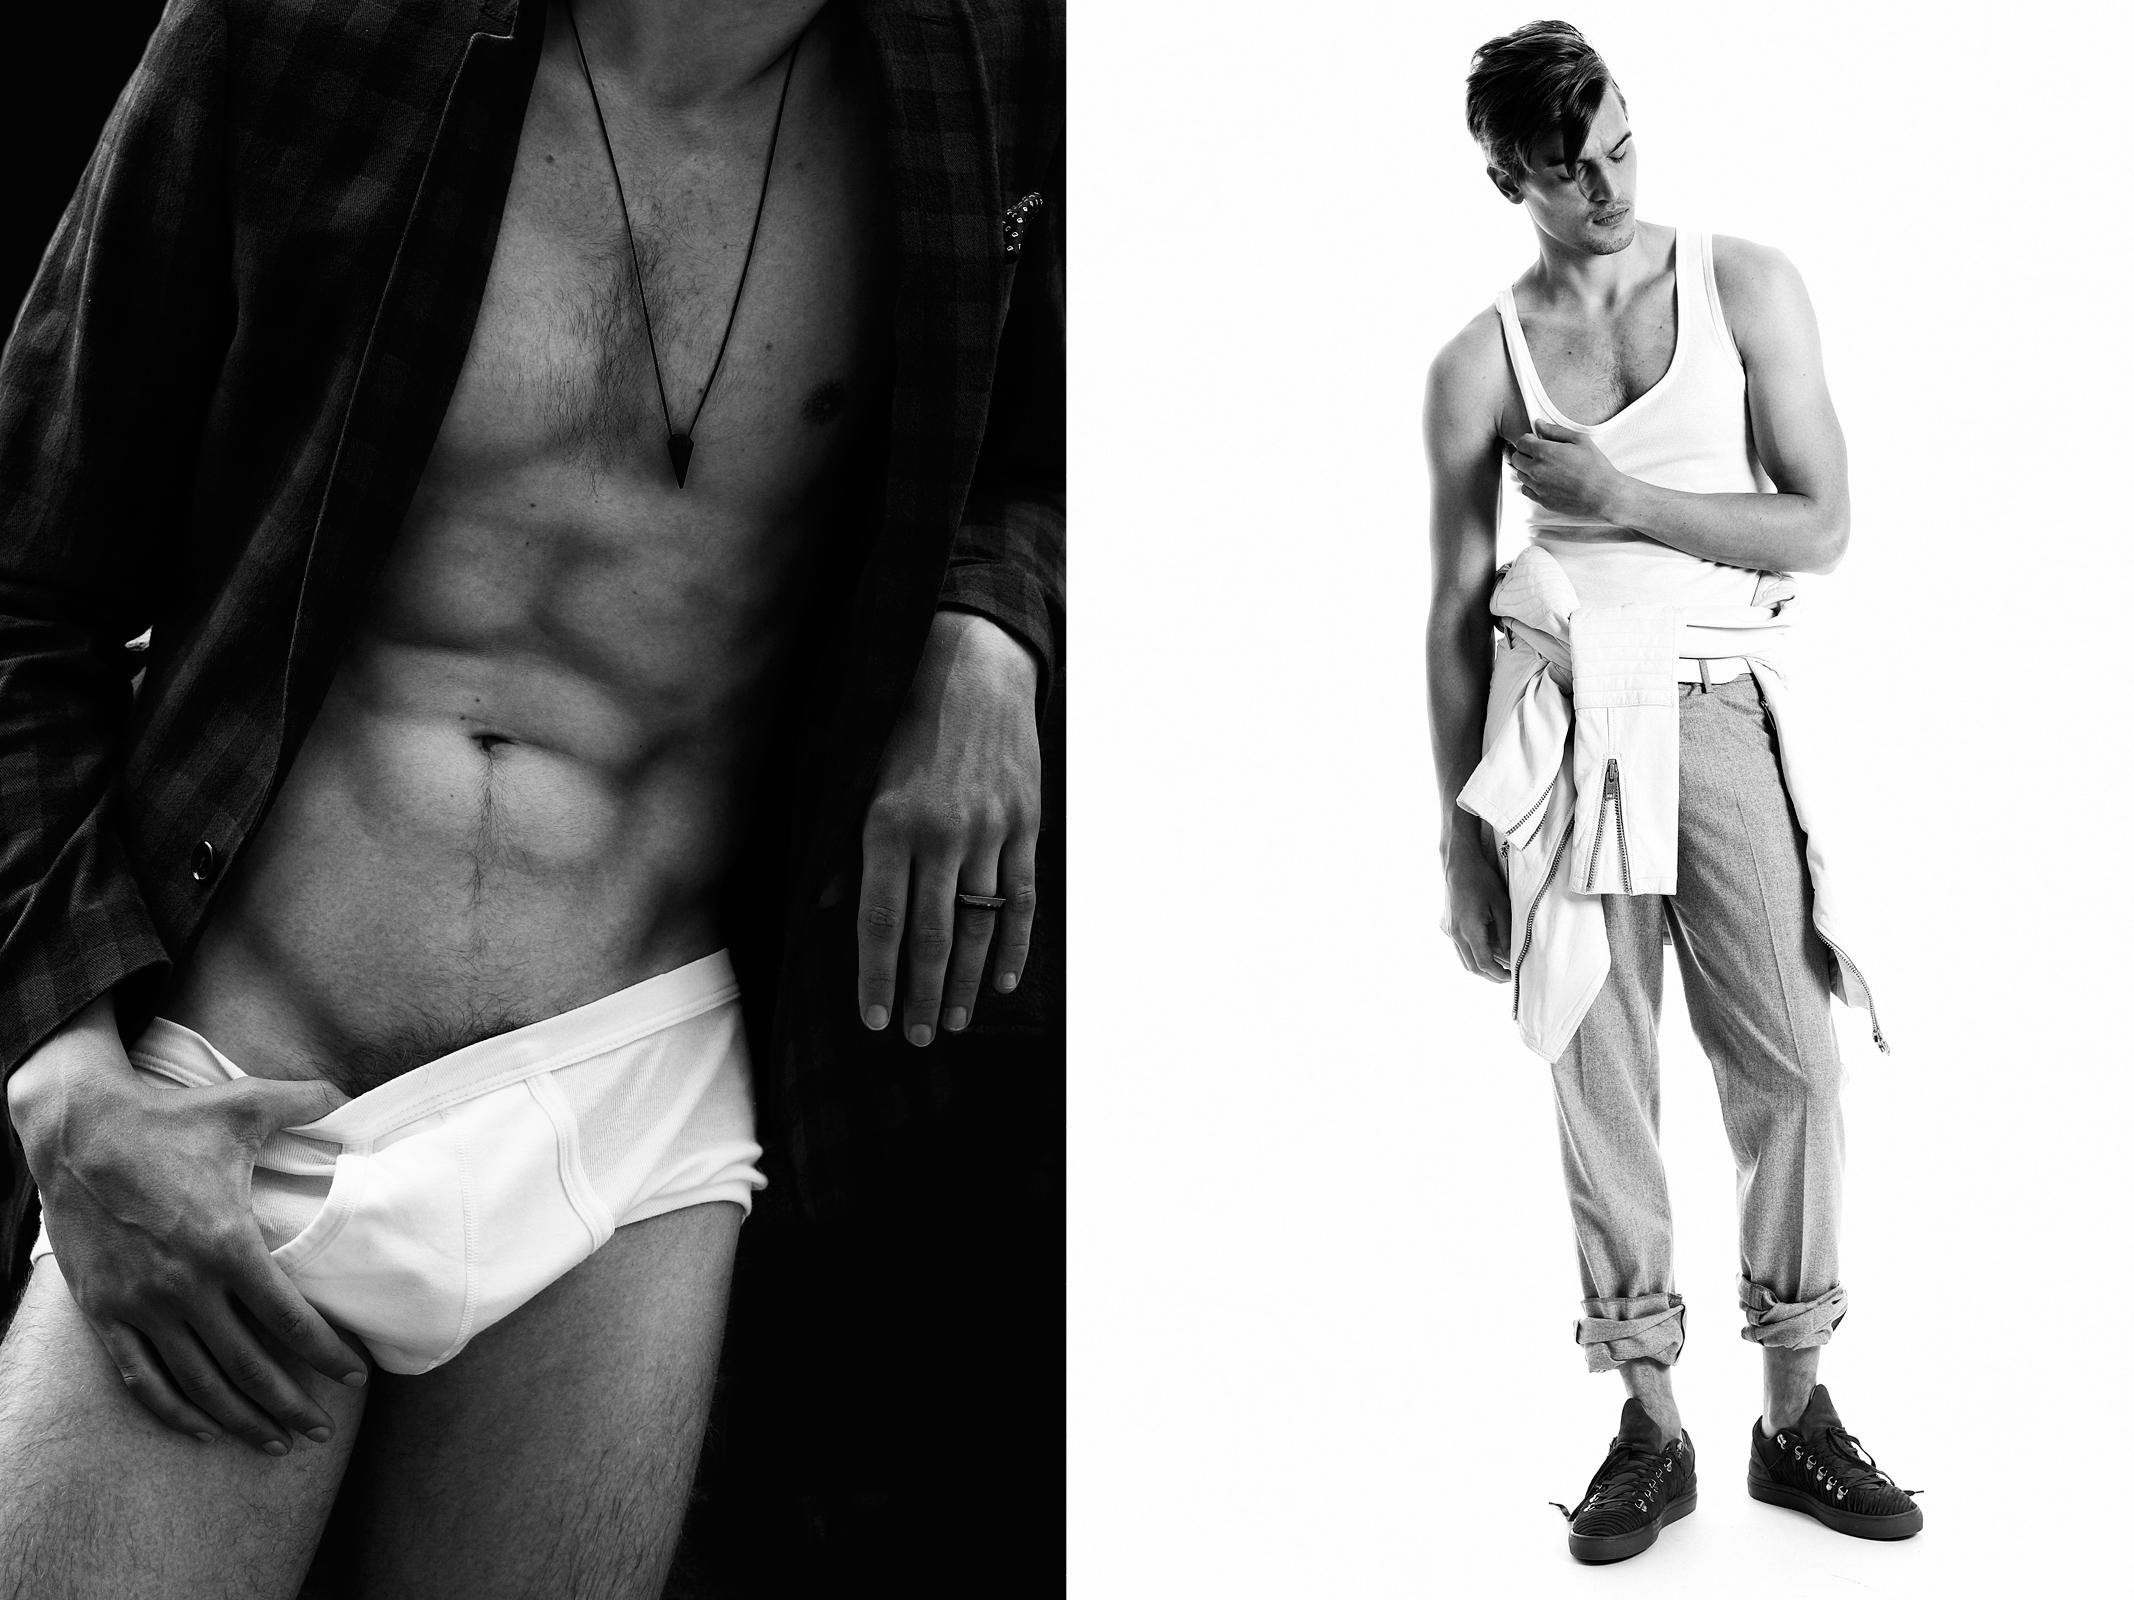 Blazer: The Suits, Briefs: Zeeman, Necklace: Icon Brand ;  Singlet: Zeeman, Flannel trousers: Hackett London, Leather jacket: Mads NØrgaard, Belt: Stylist own, Ring: Icon Brand,  Shoes: Filling Pieces